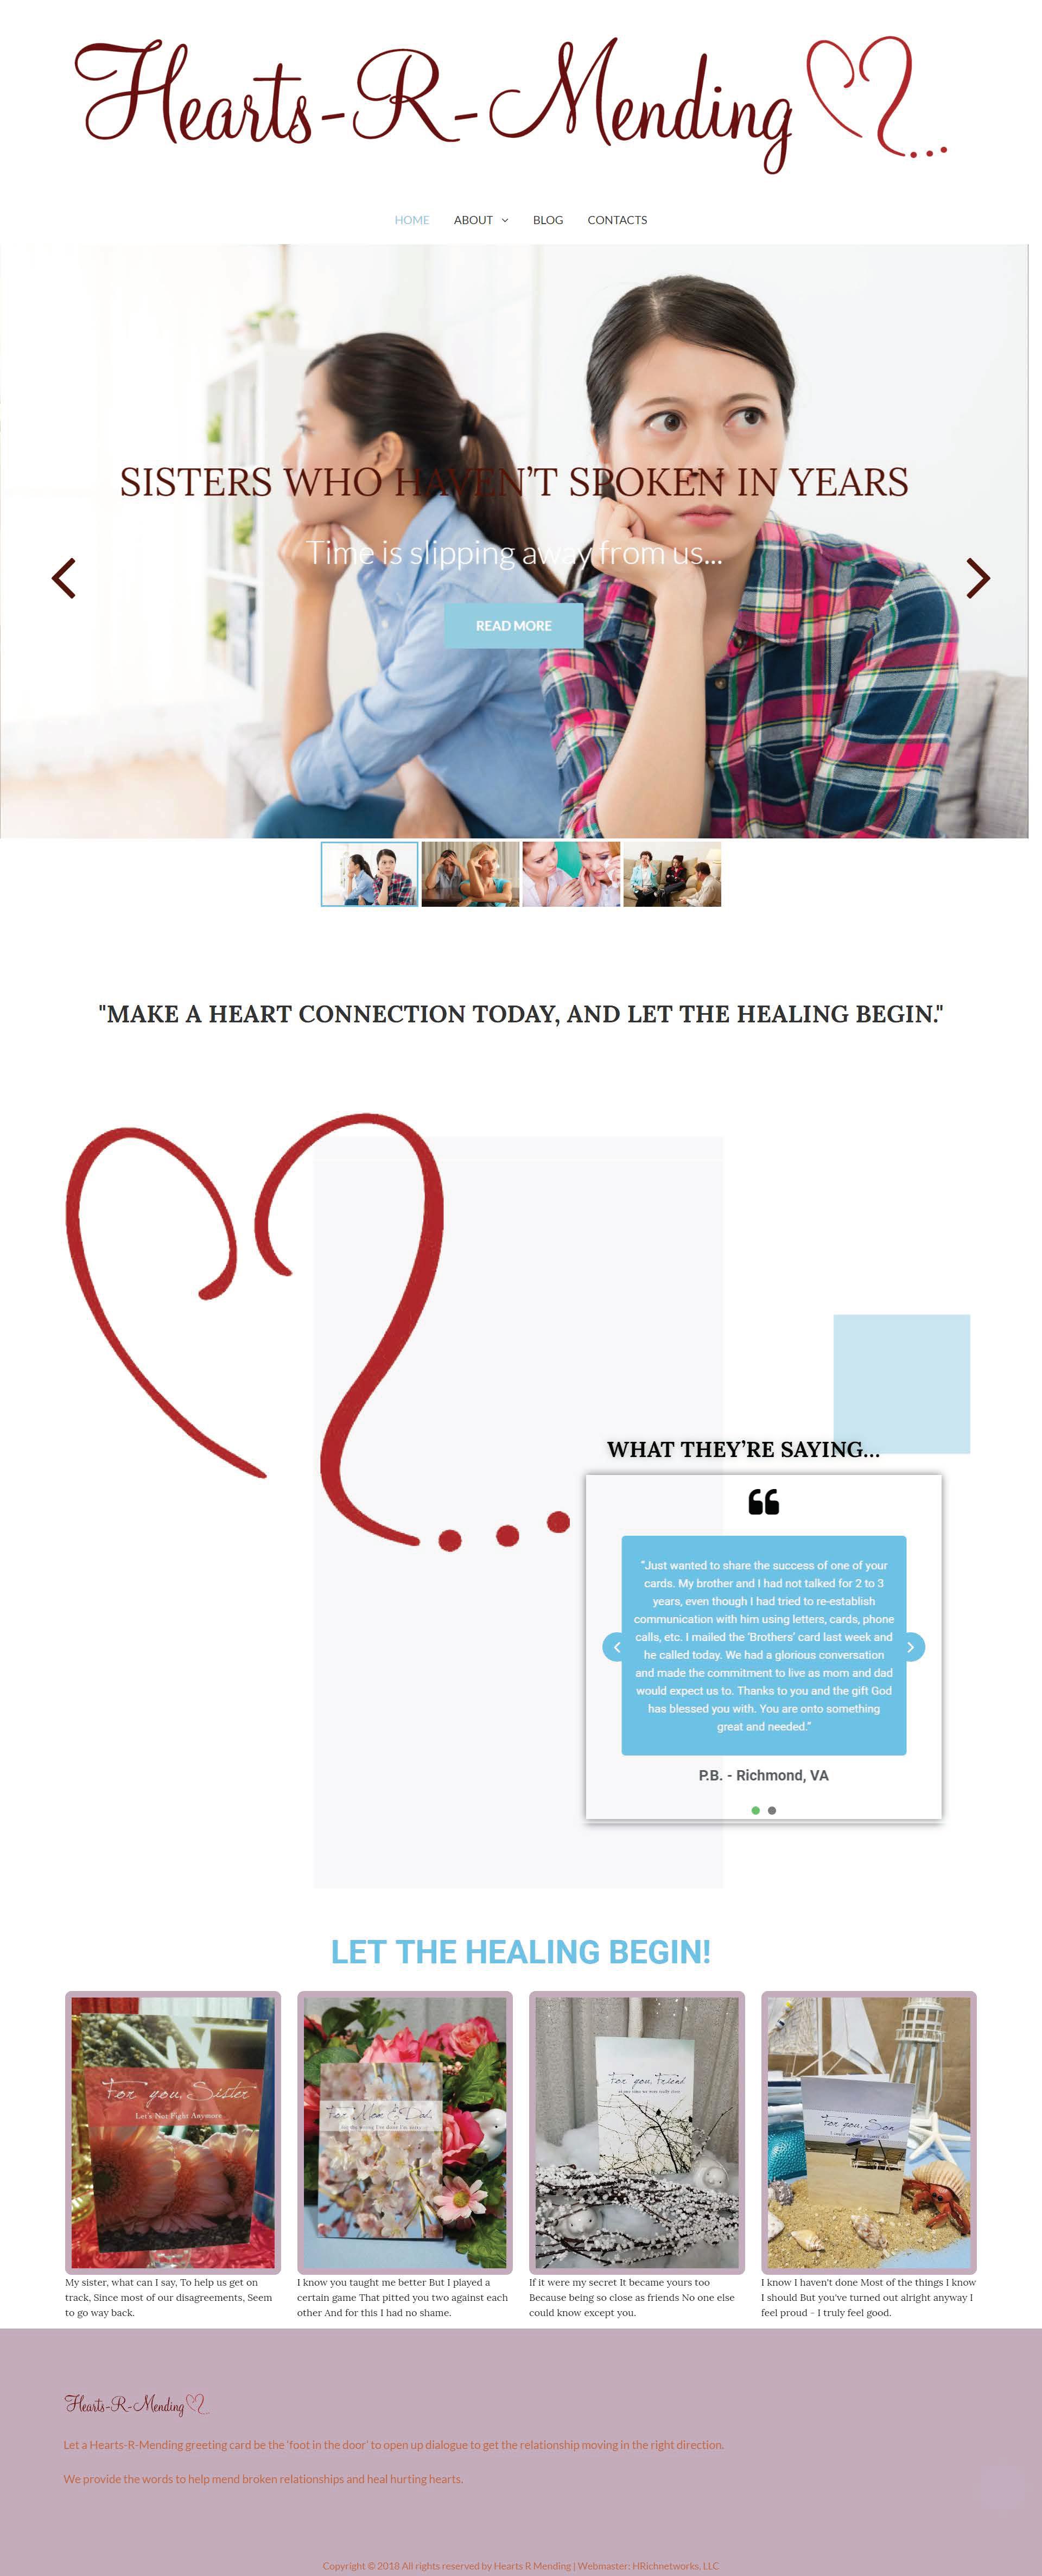 Hearts-R-Mending